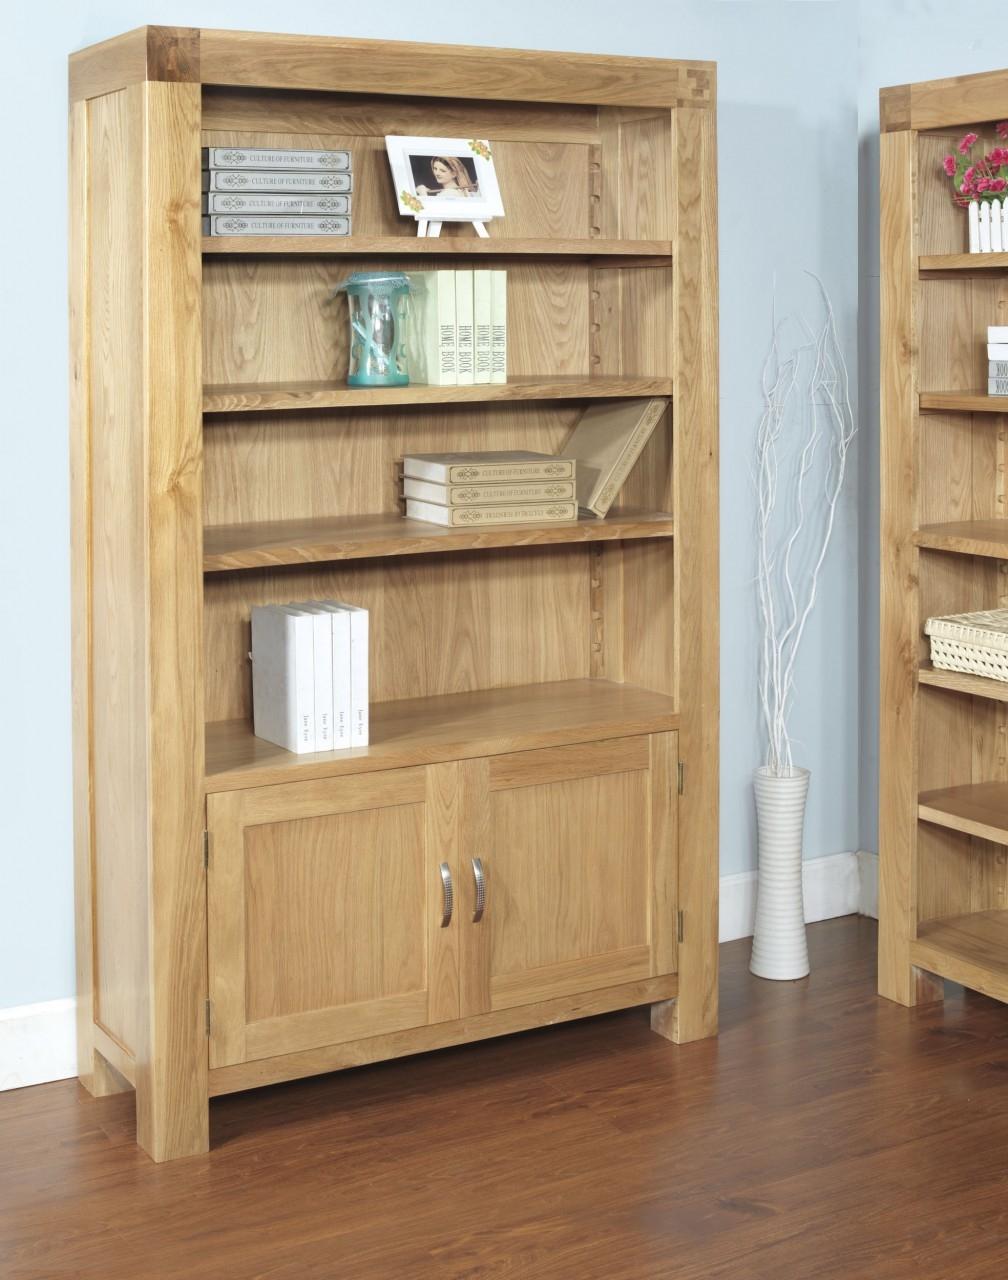 Design Wondrous Solid Oak Shelving Uk Shelf Design Fascinating Inside Contemporary Oak Shelving Units (View 9 of 15)